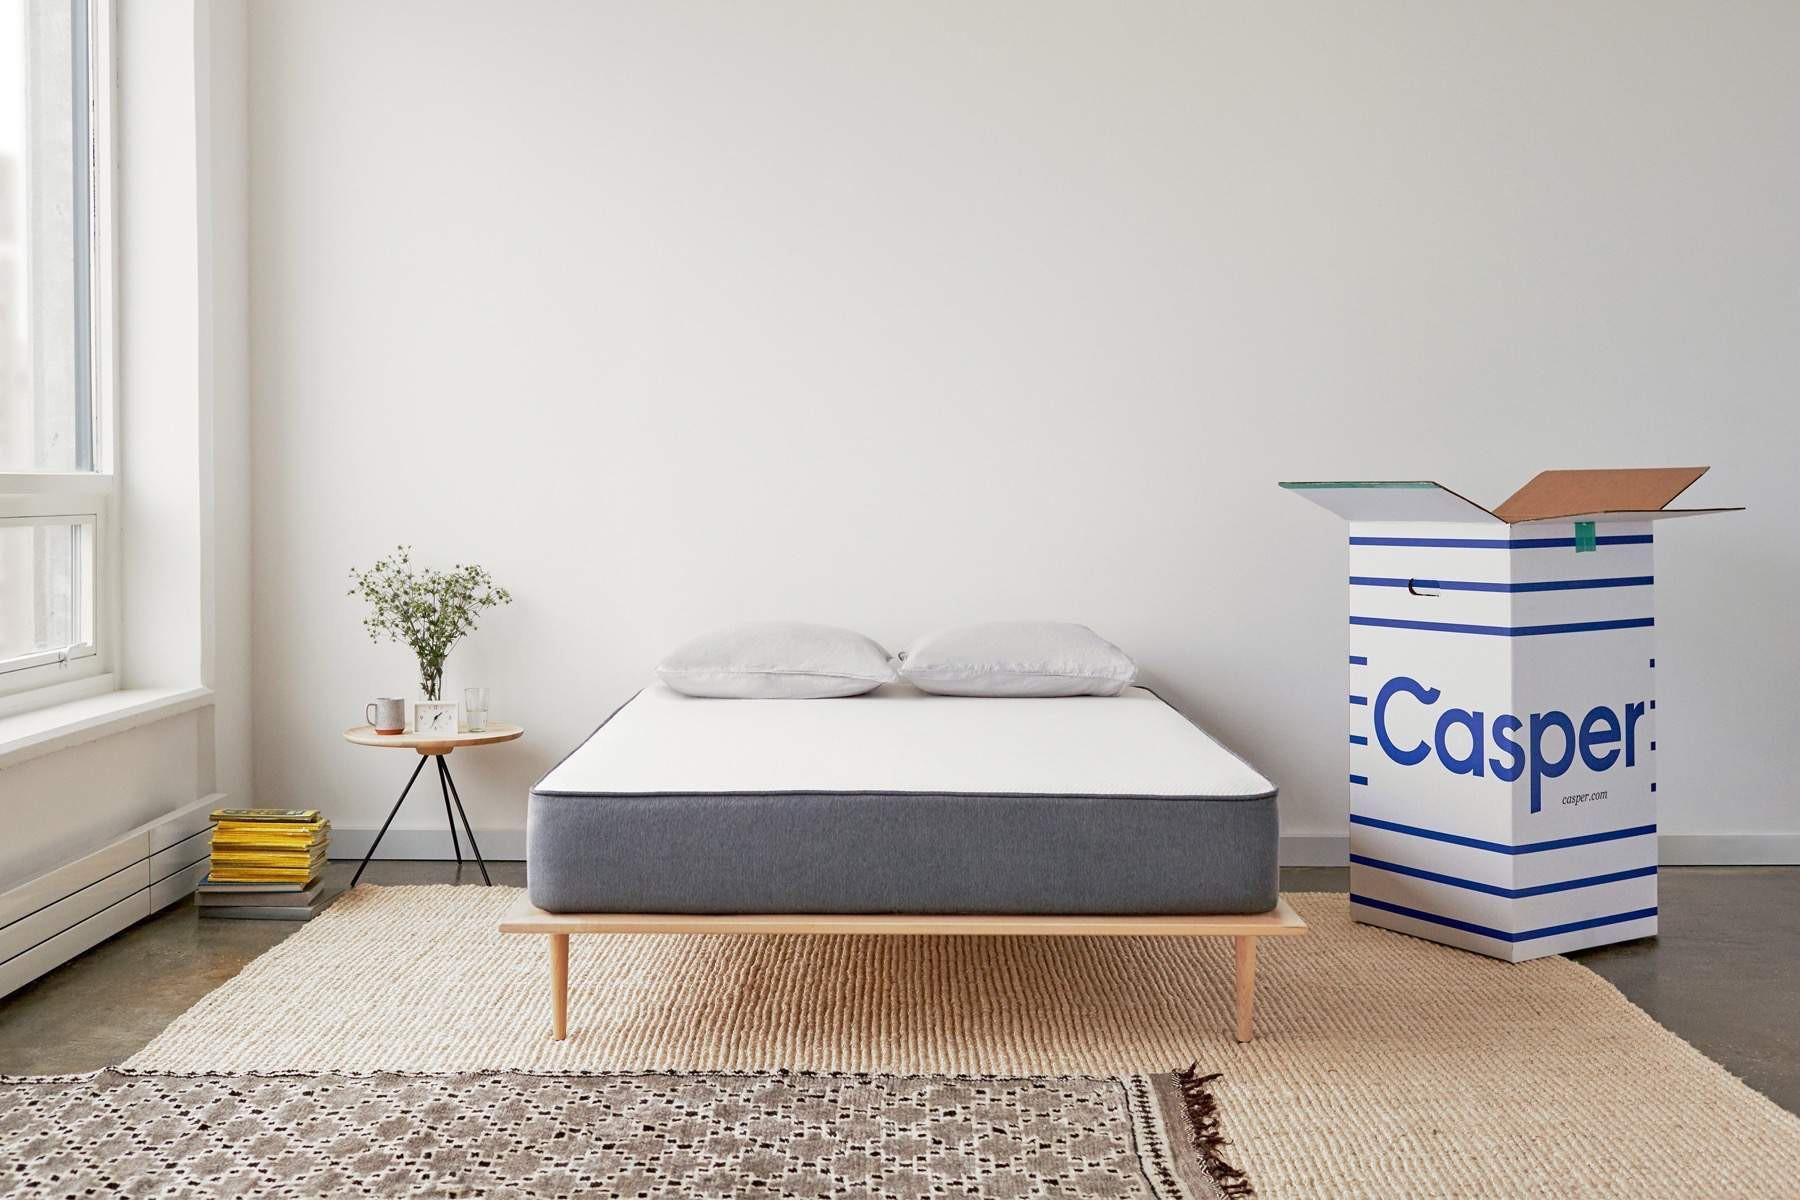 56 Sauber Bett1 Bodyguard Erfahrung Mit Bildern Schlafzimmermobel Bett Ideen Matratze